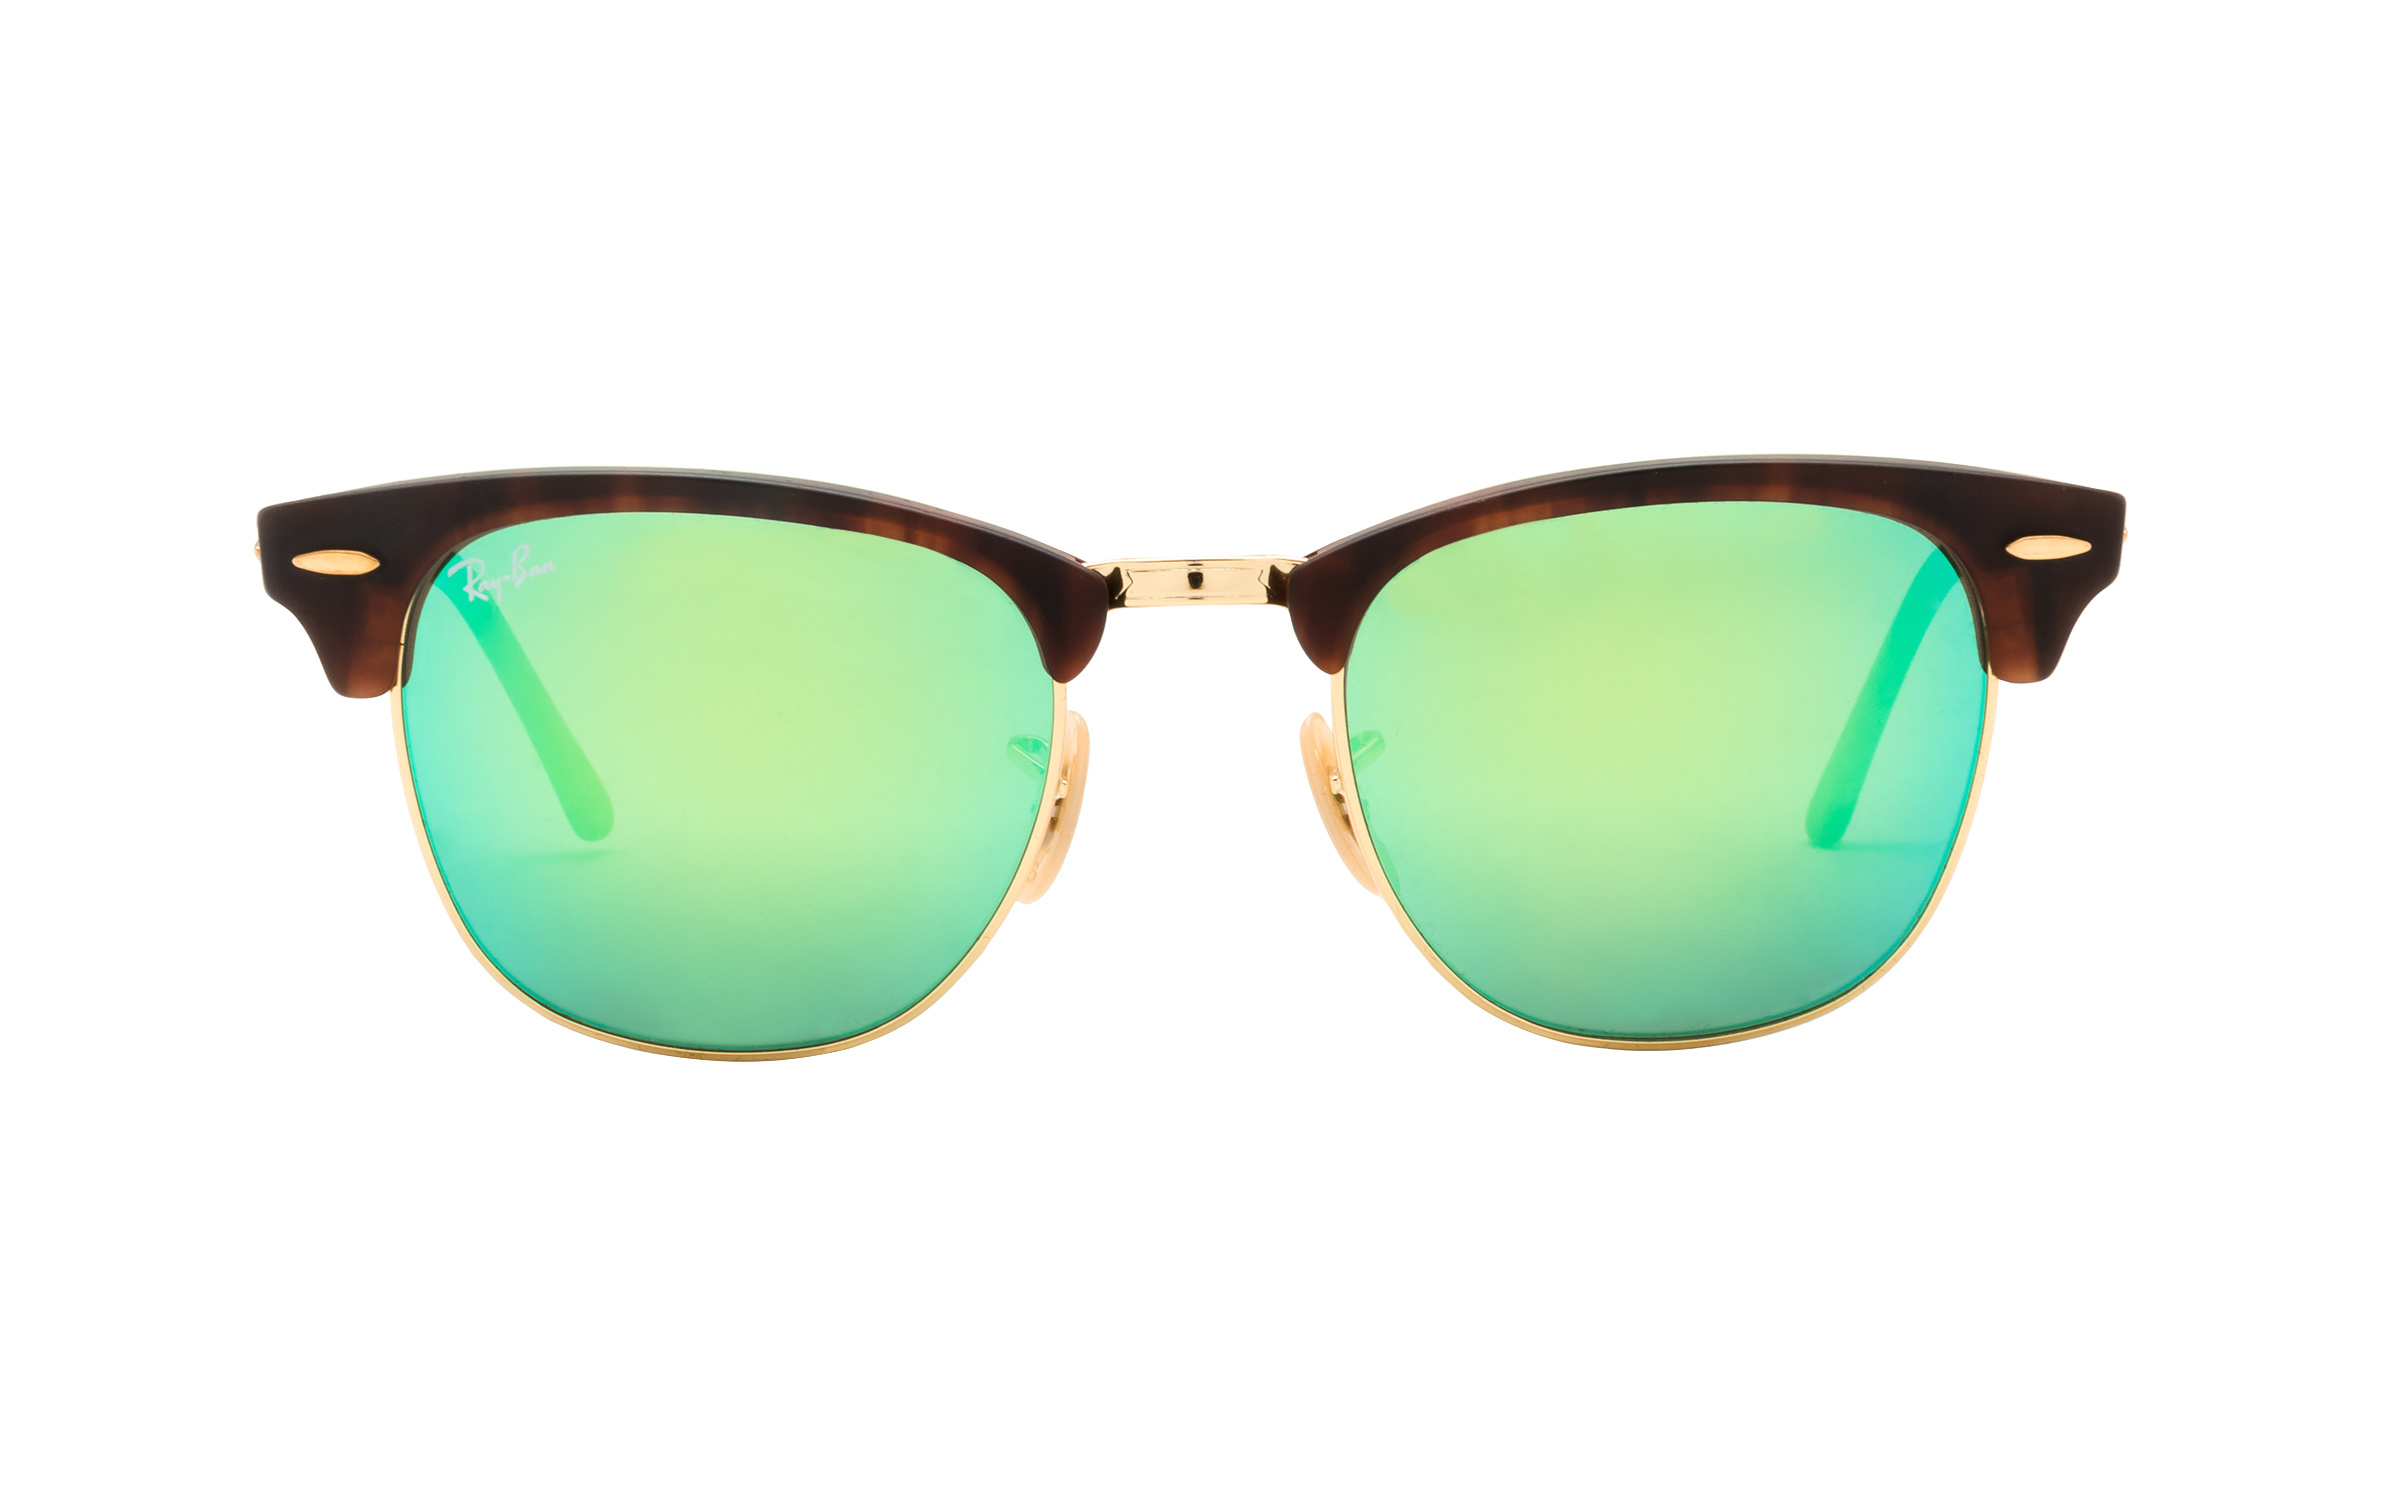 Ray-Ban Sunglasses Clubmaster Tortoise Acetate Online Coastal